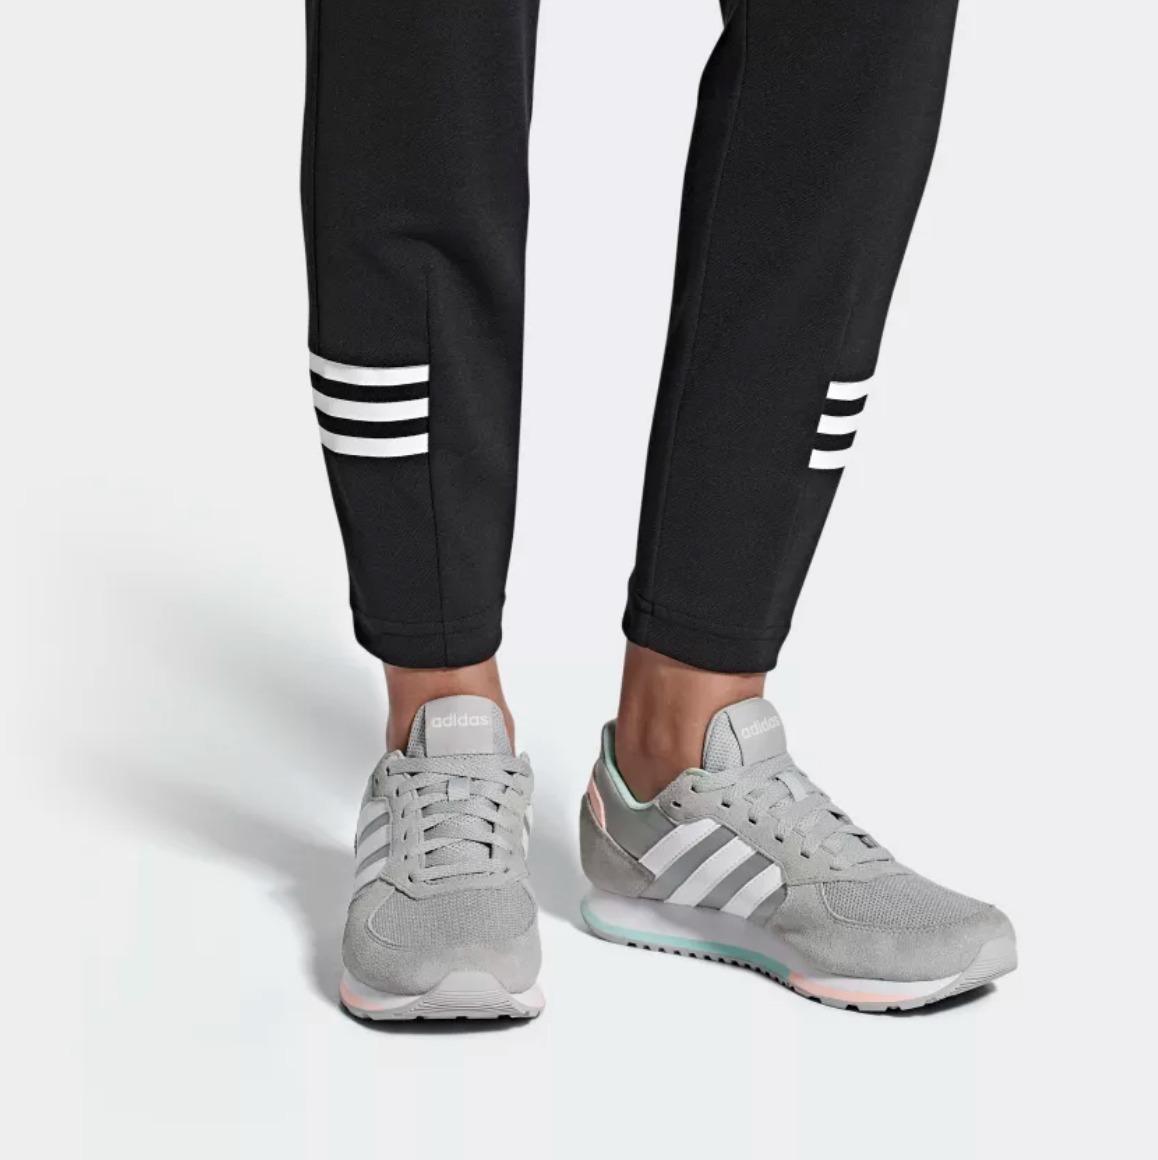 Zapatillas adidas Urbanas 8k W Mujer Negro O Gris Abc Depor